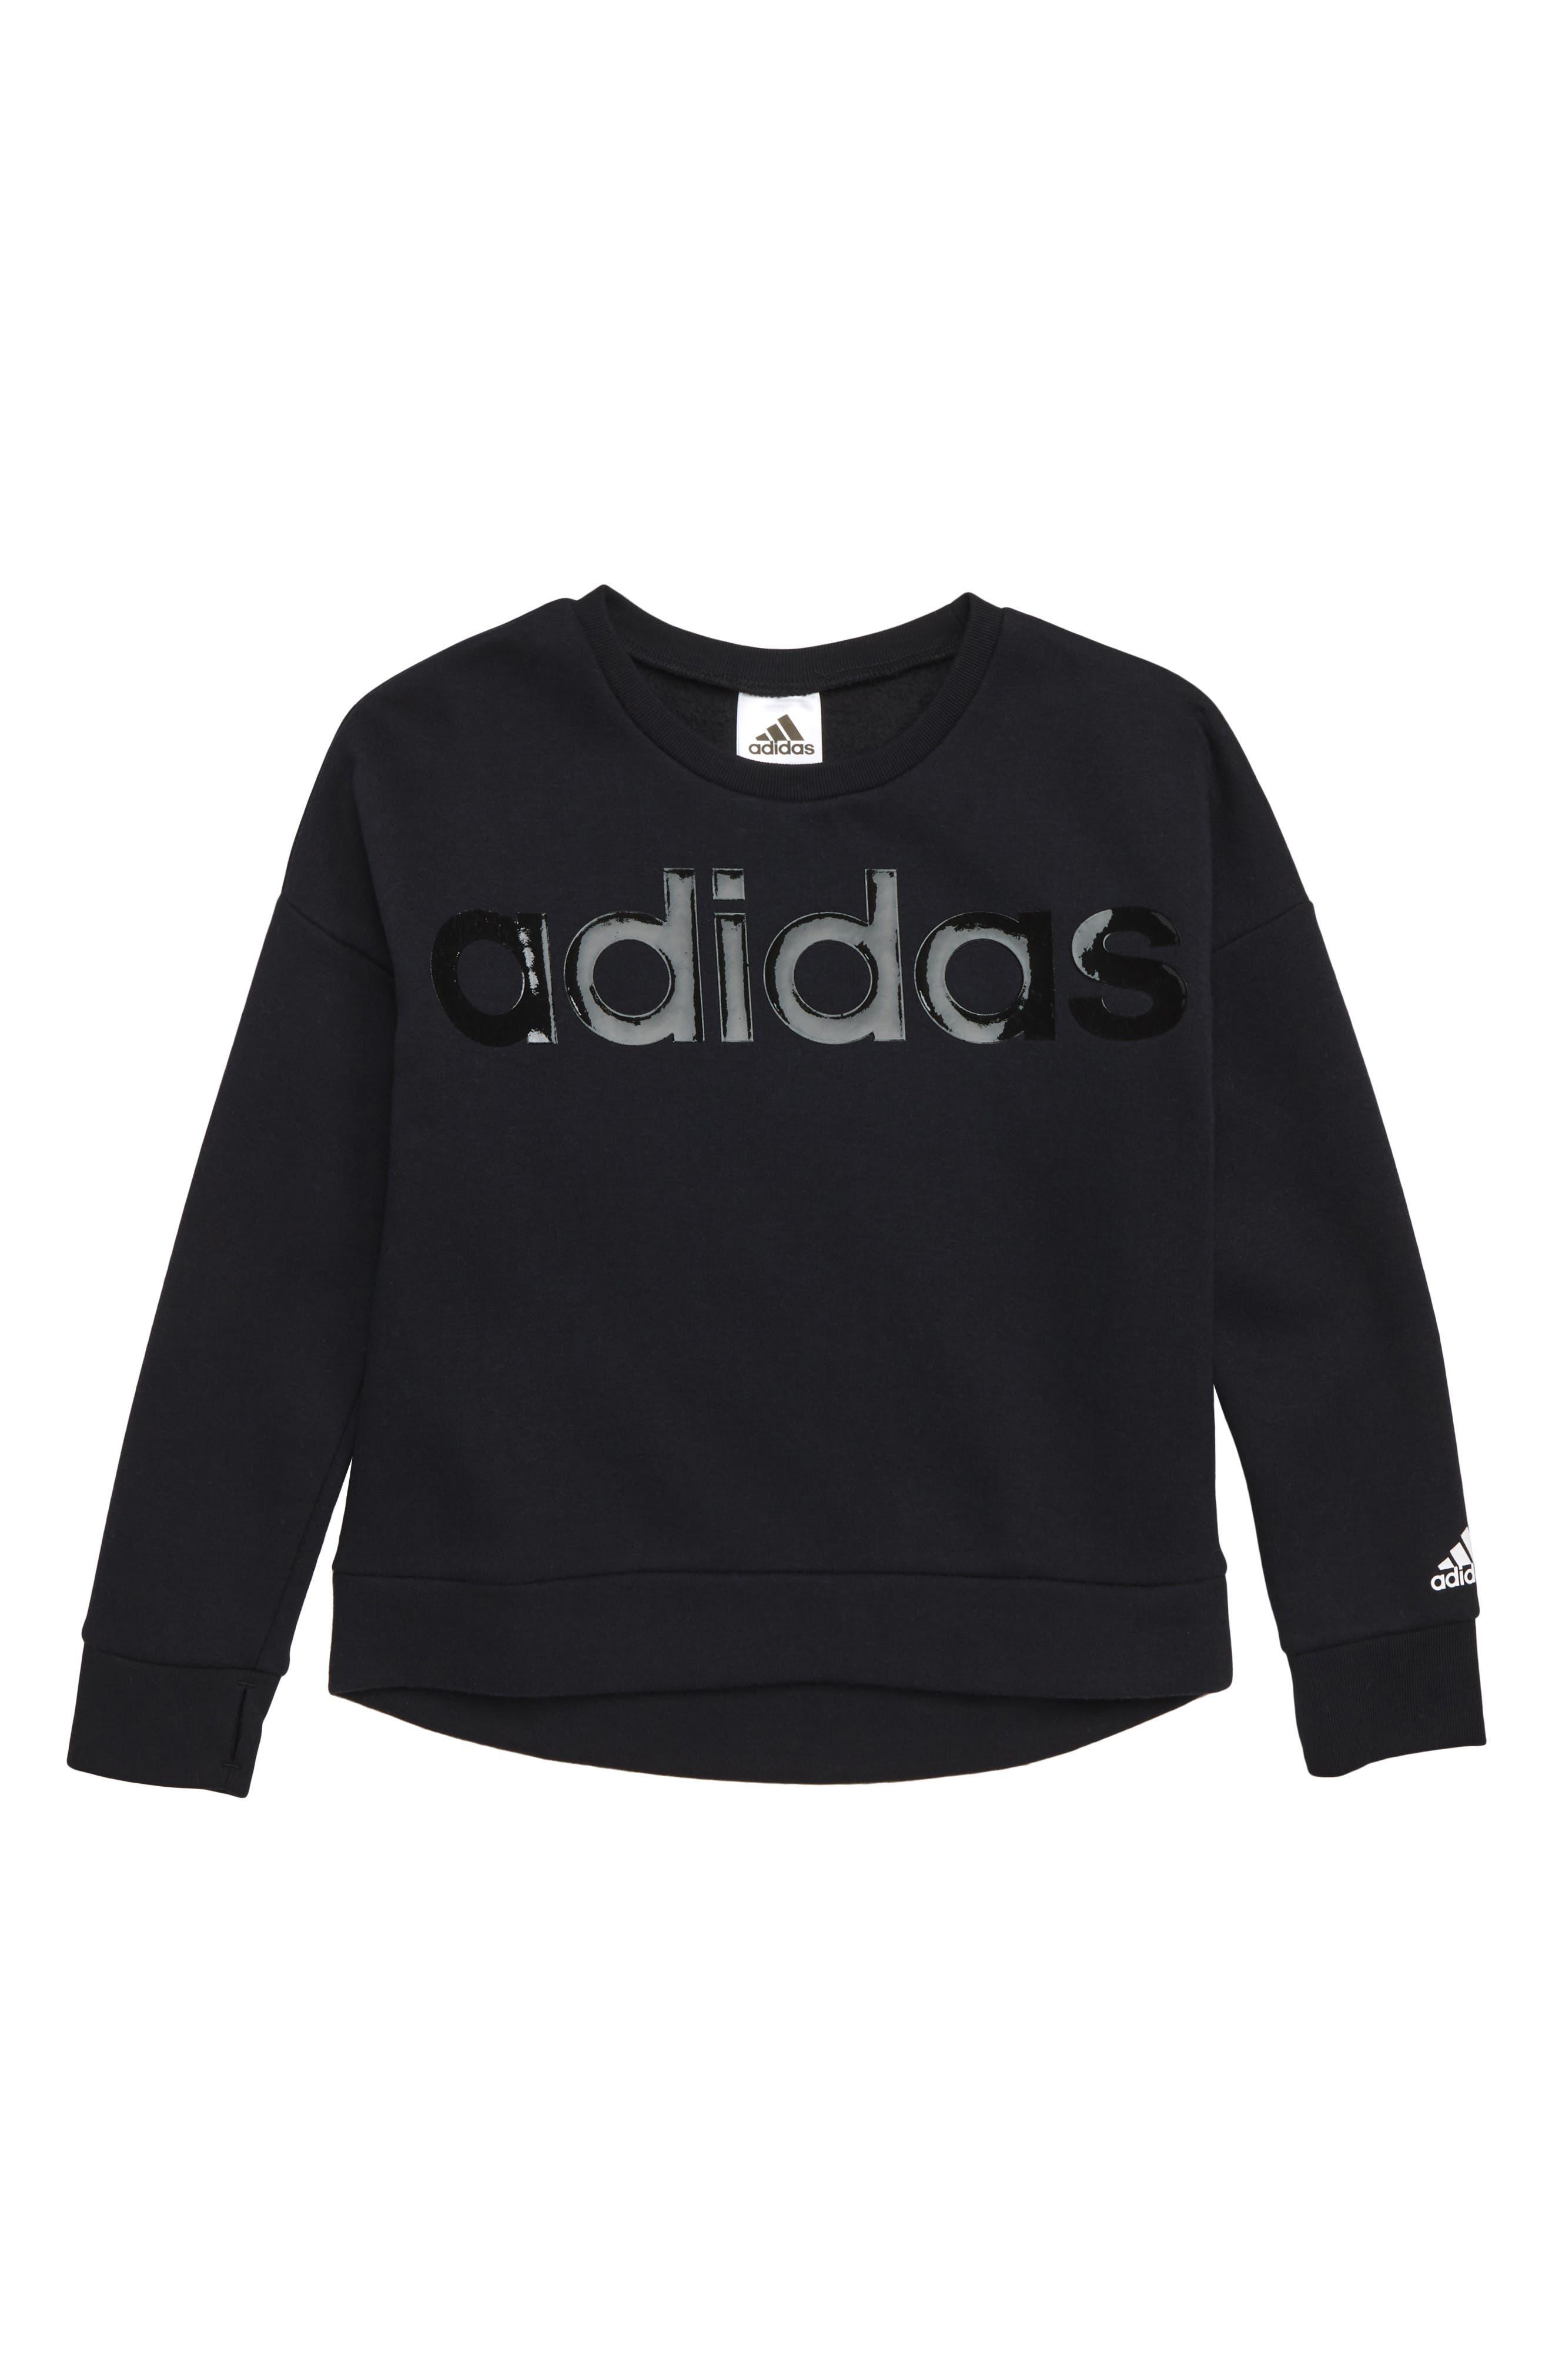 Cropped Sweatshirt,                         Main,                         color, BLACK